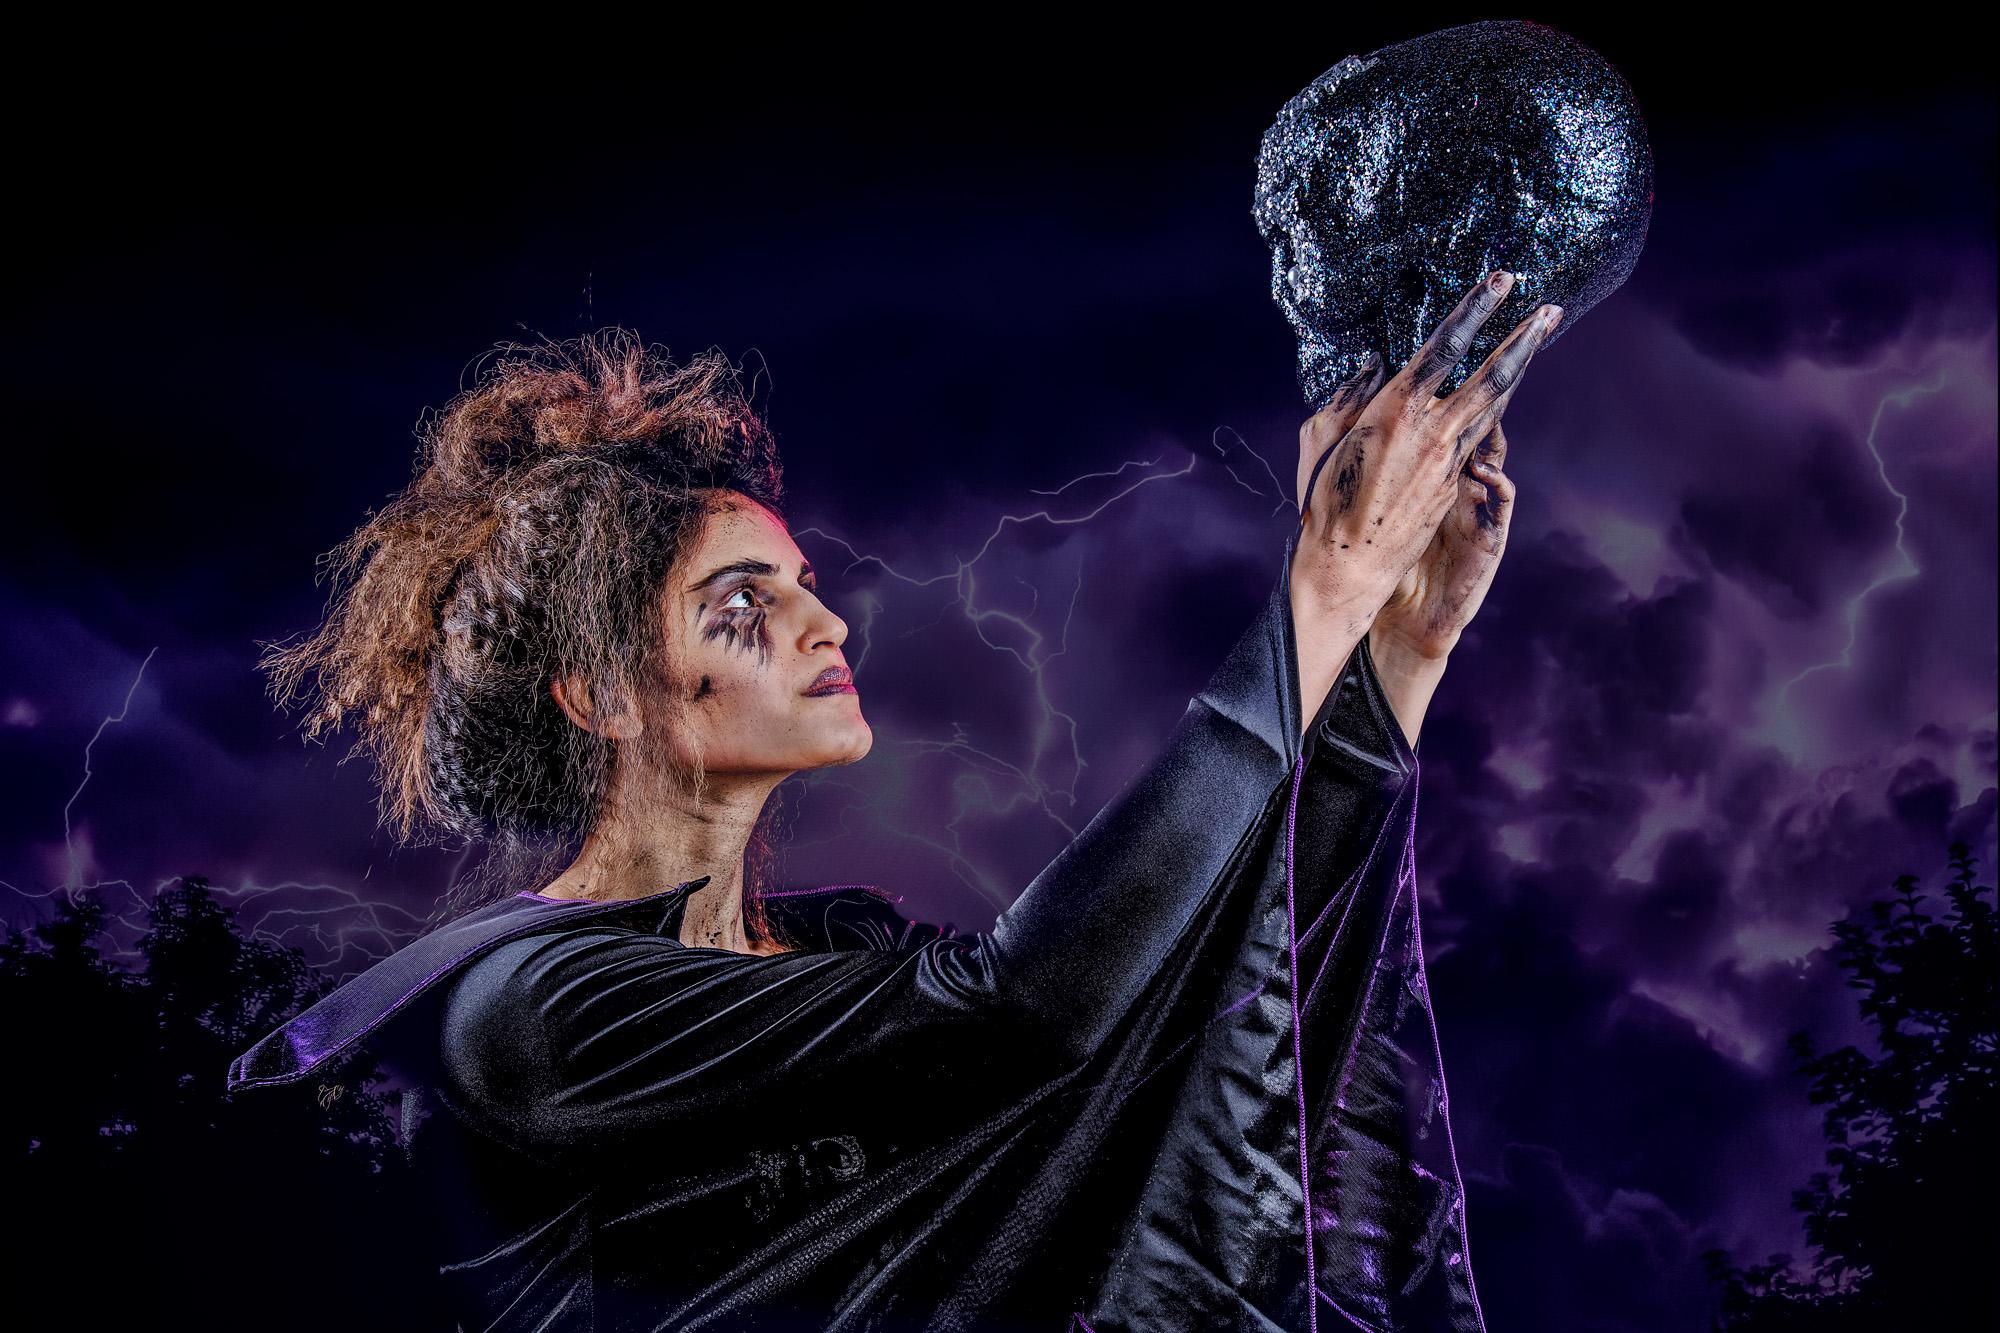 Lavanya Chowdhury -Oxford Atelier's Halloween Open Studio Evening